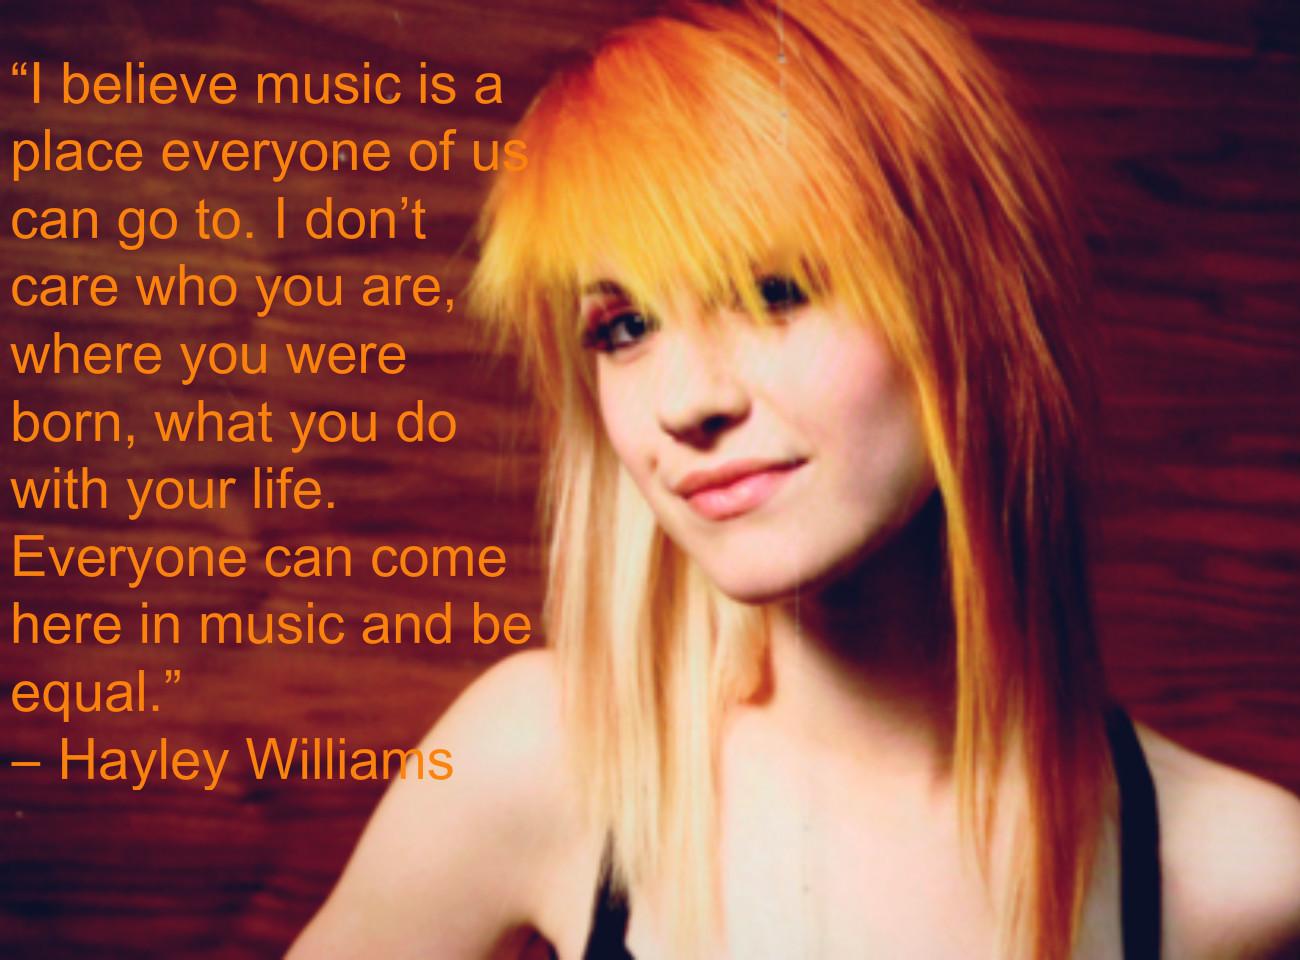 Hayley Williams's quote #2